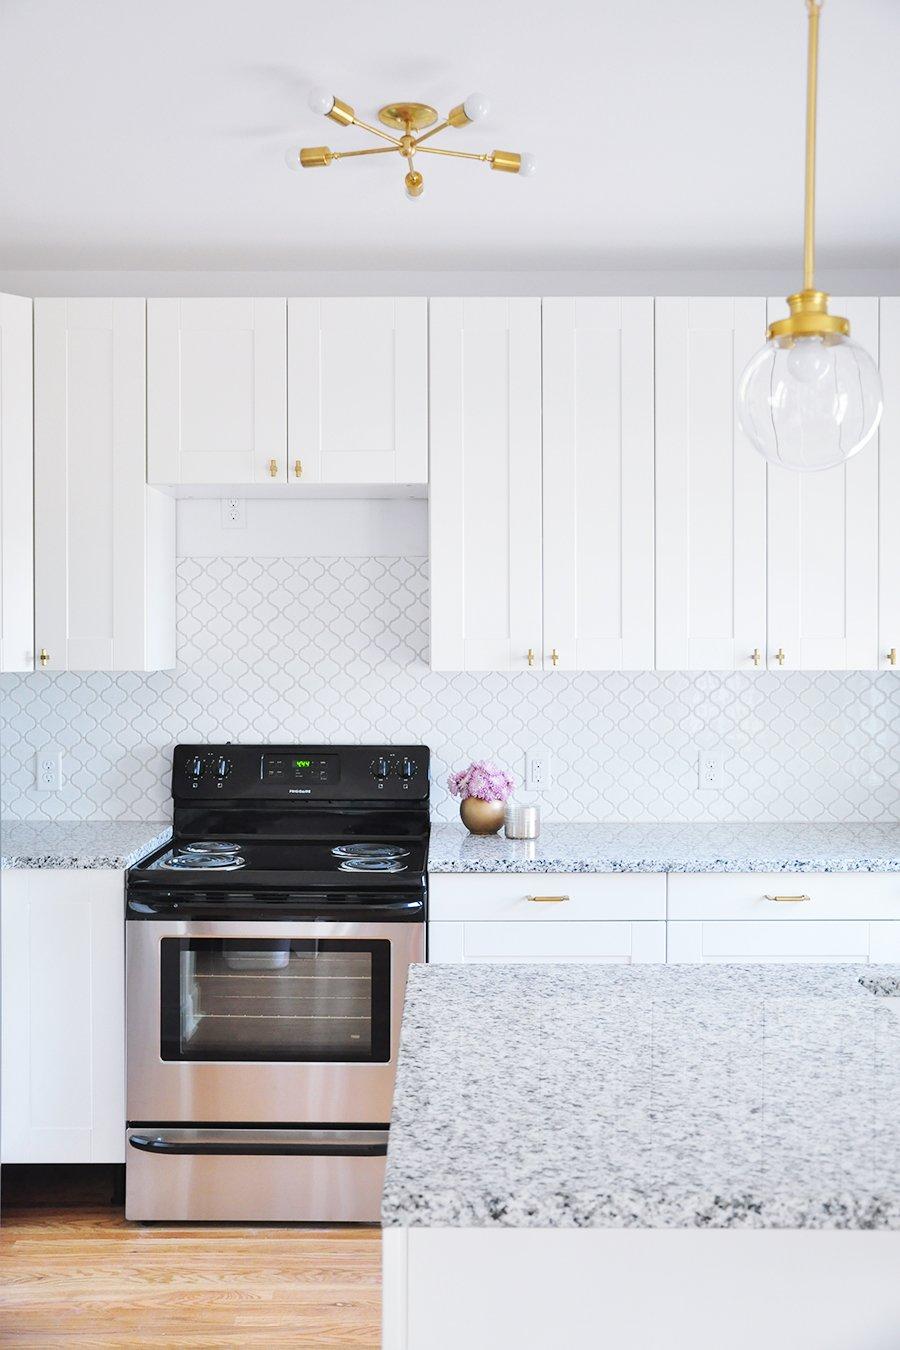 home-renovation-progress-report-kitchen-updates-12